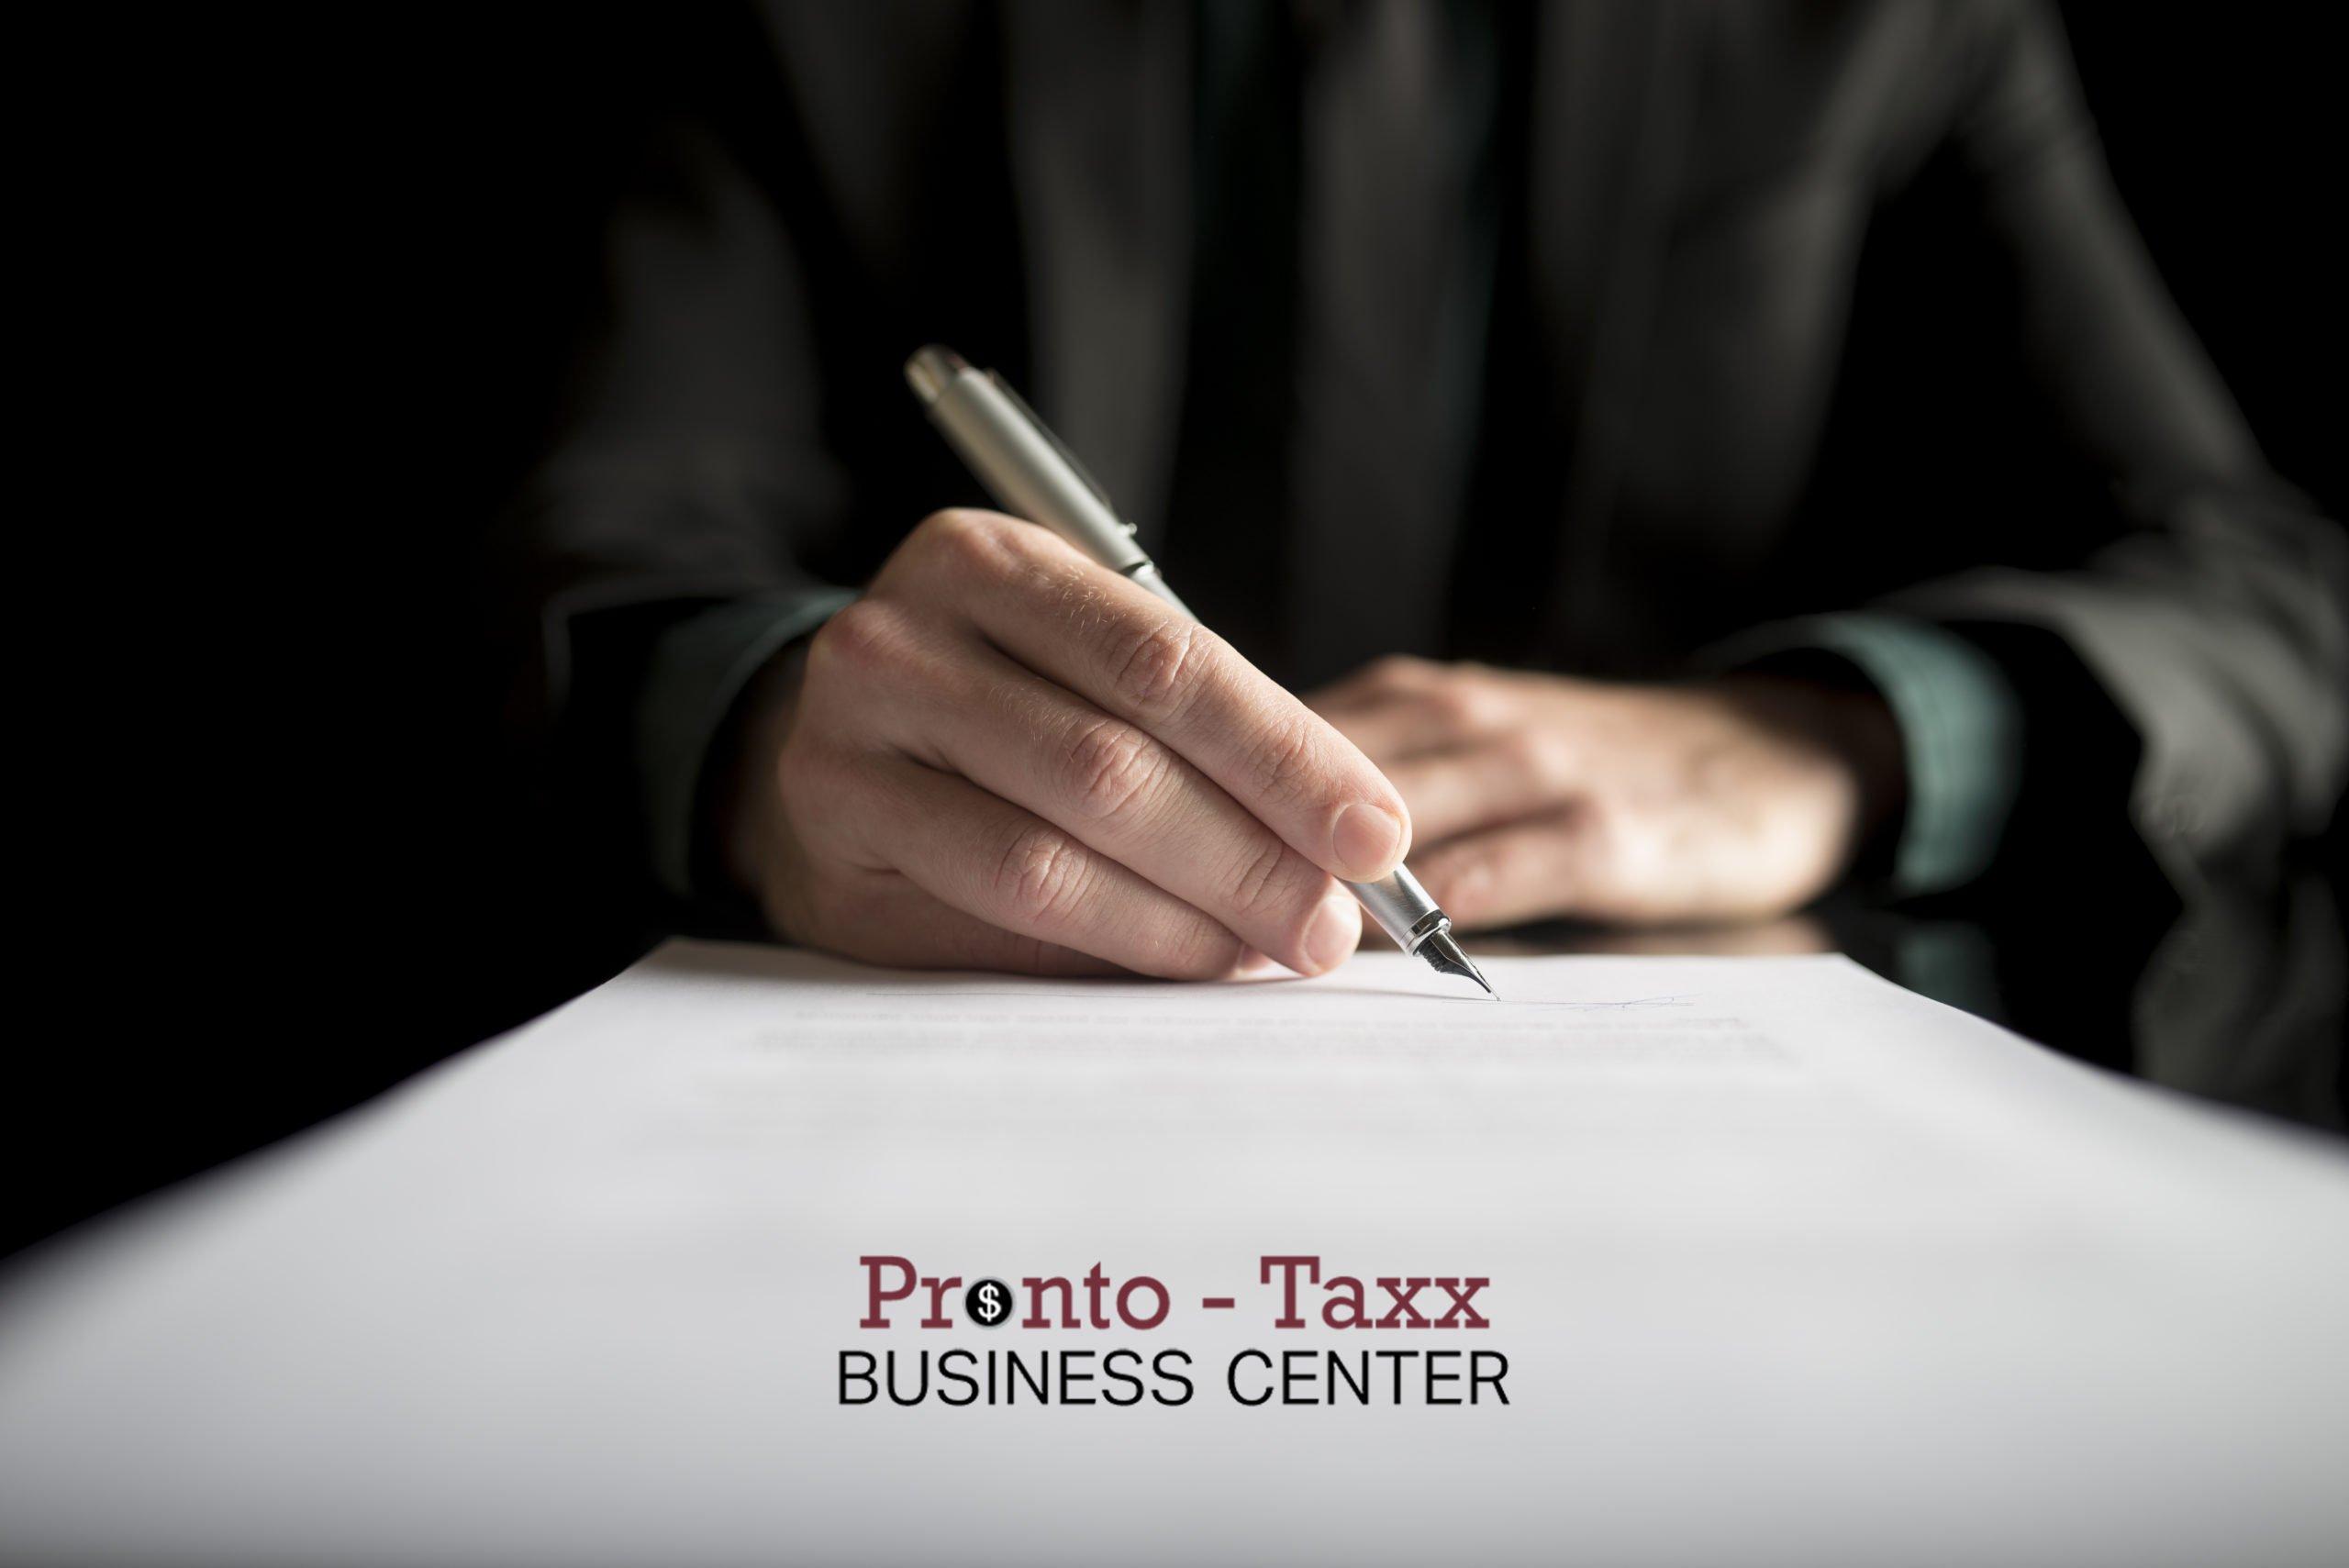 Pronto Taxx